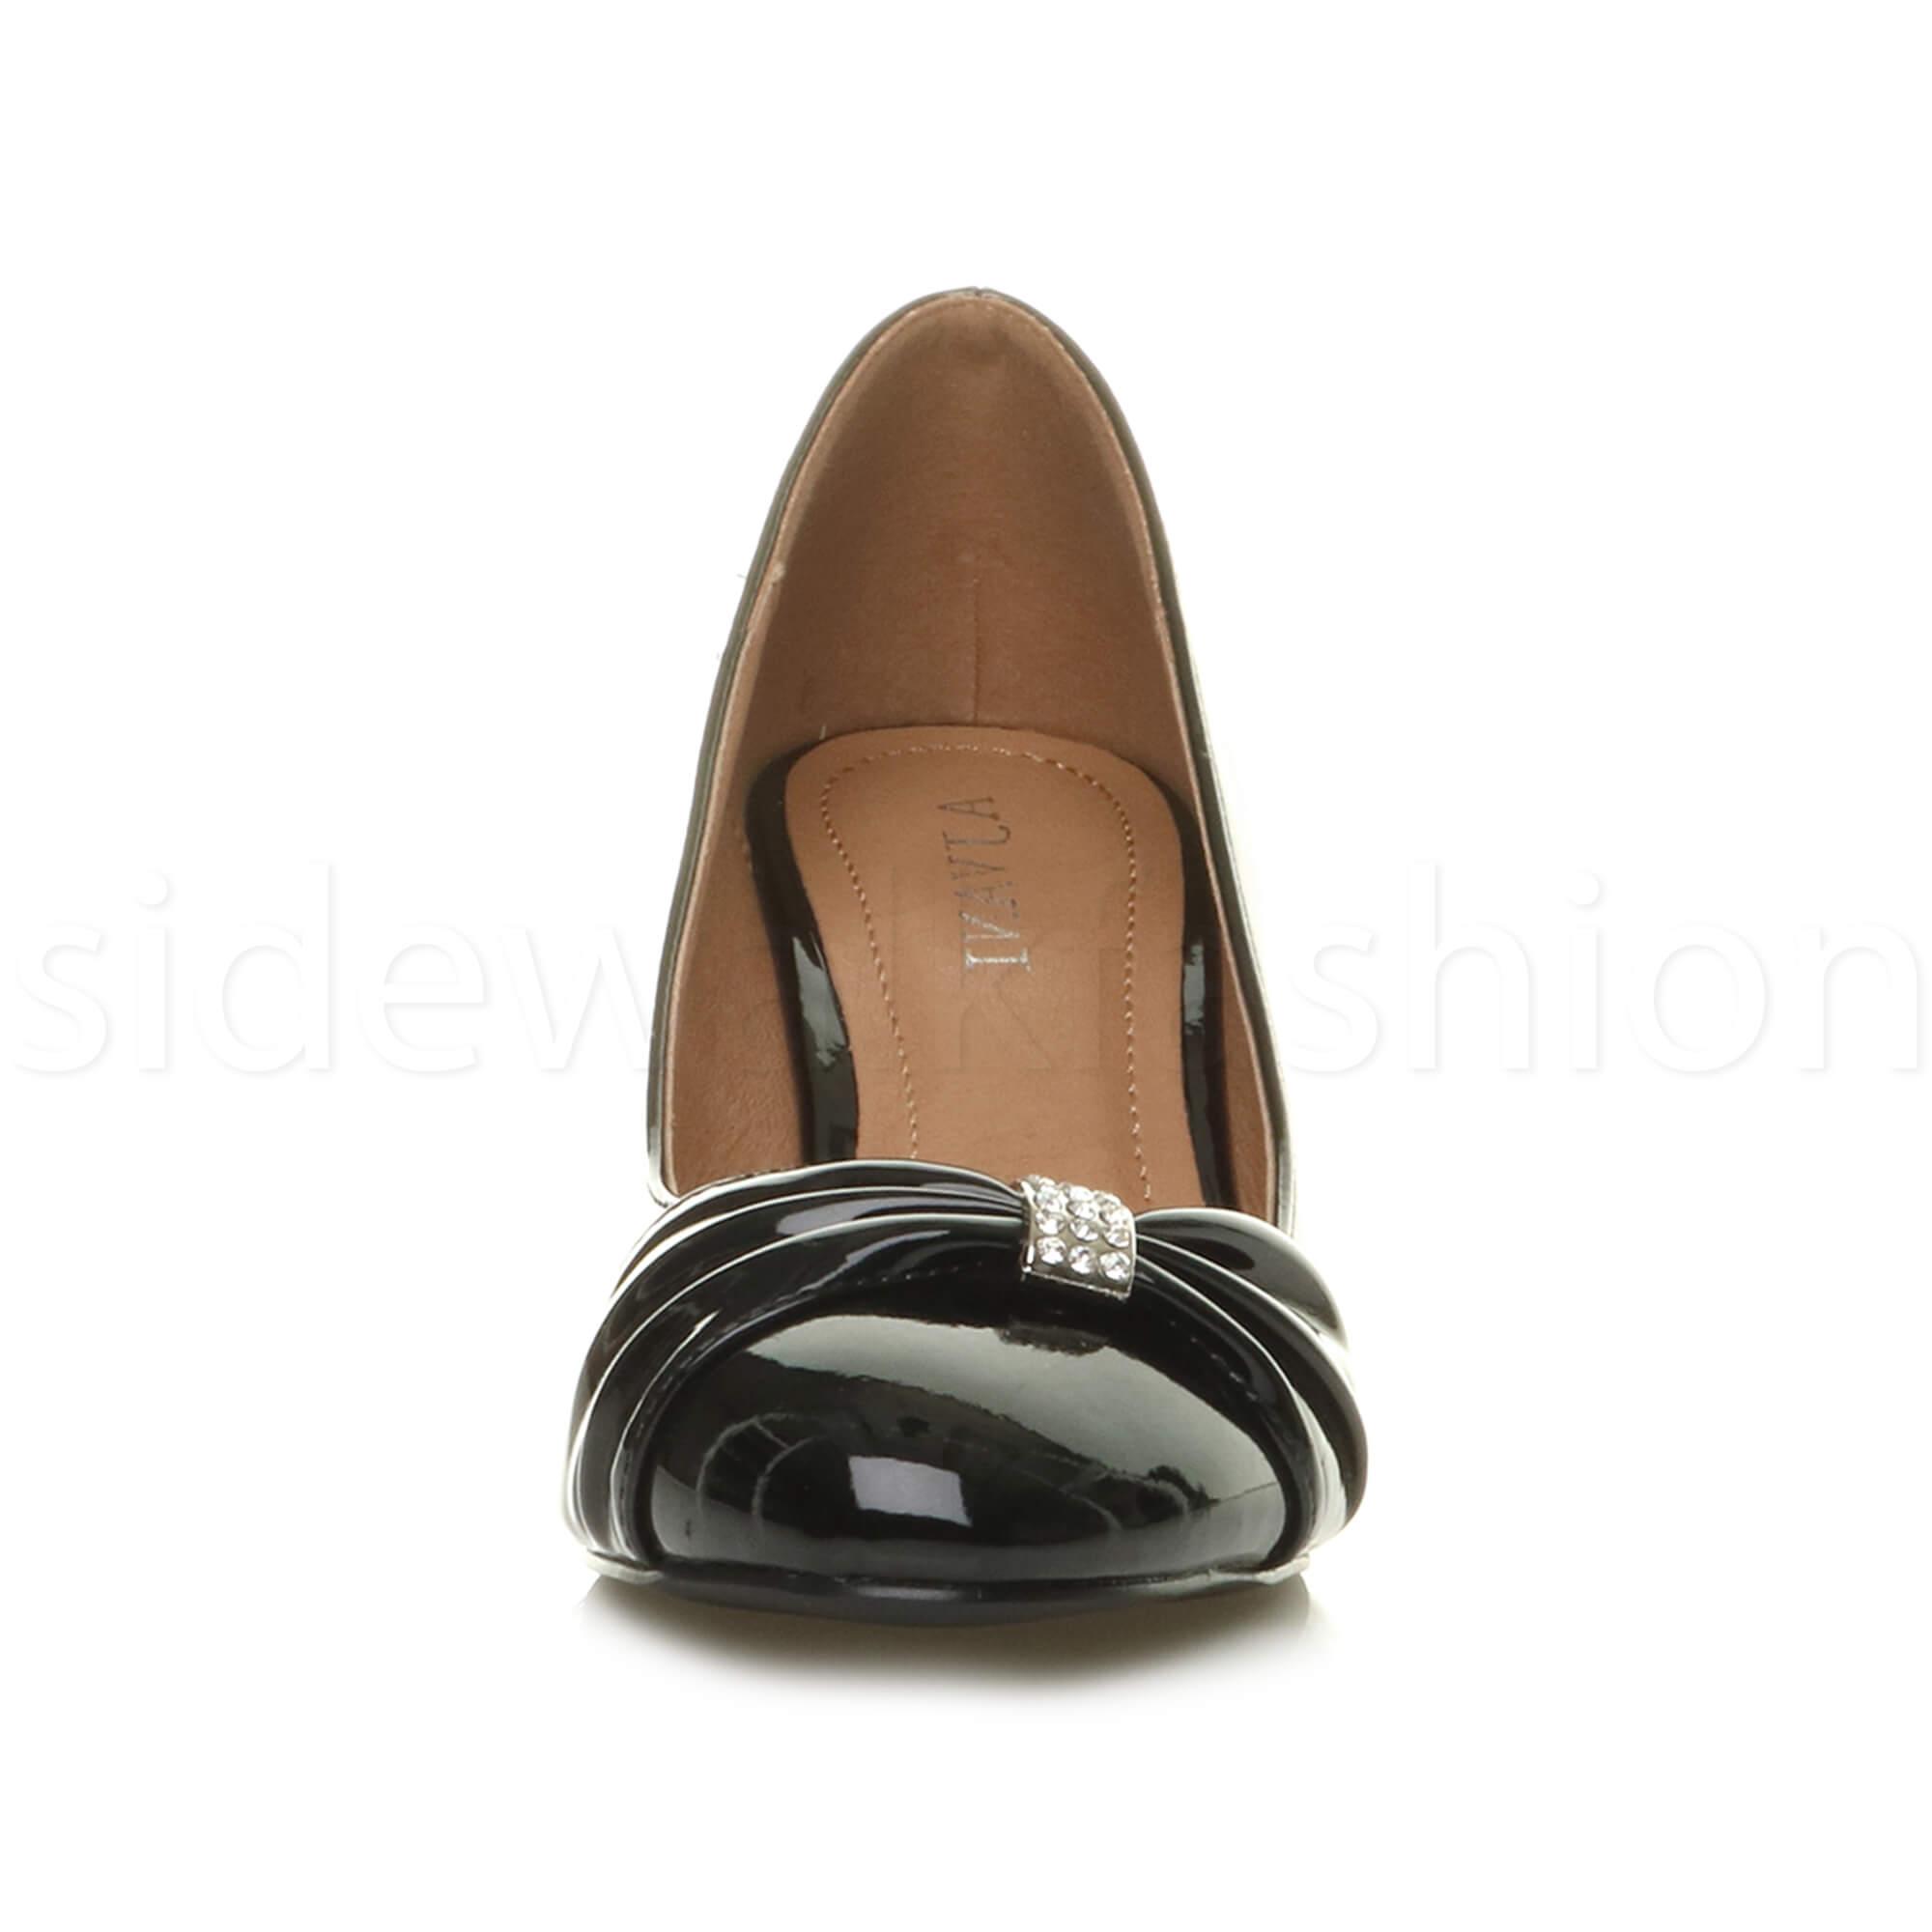 Womens-ladies-low-mid-heel-diamante-party-smart-evening-court-shoes-size thumbnail 15